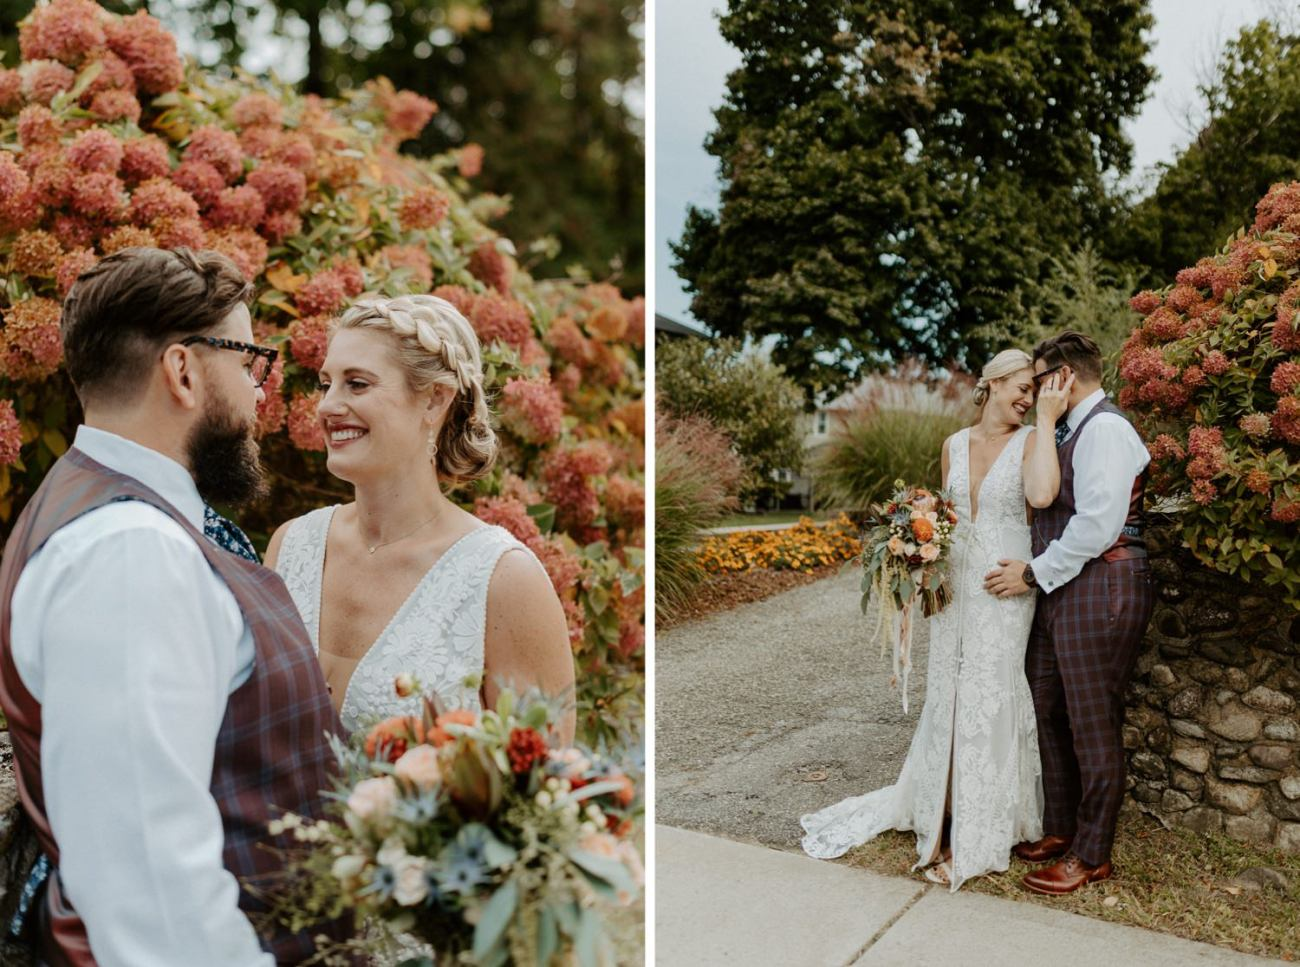 New Jersey Fall Backyard Wedding Bend Wedding Photographer NJ Wedding Photographer Anais Possamai Photography 023